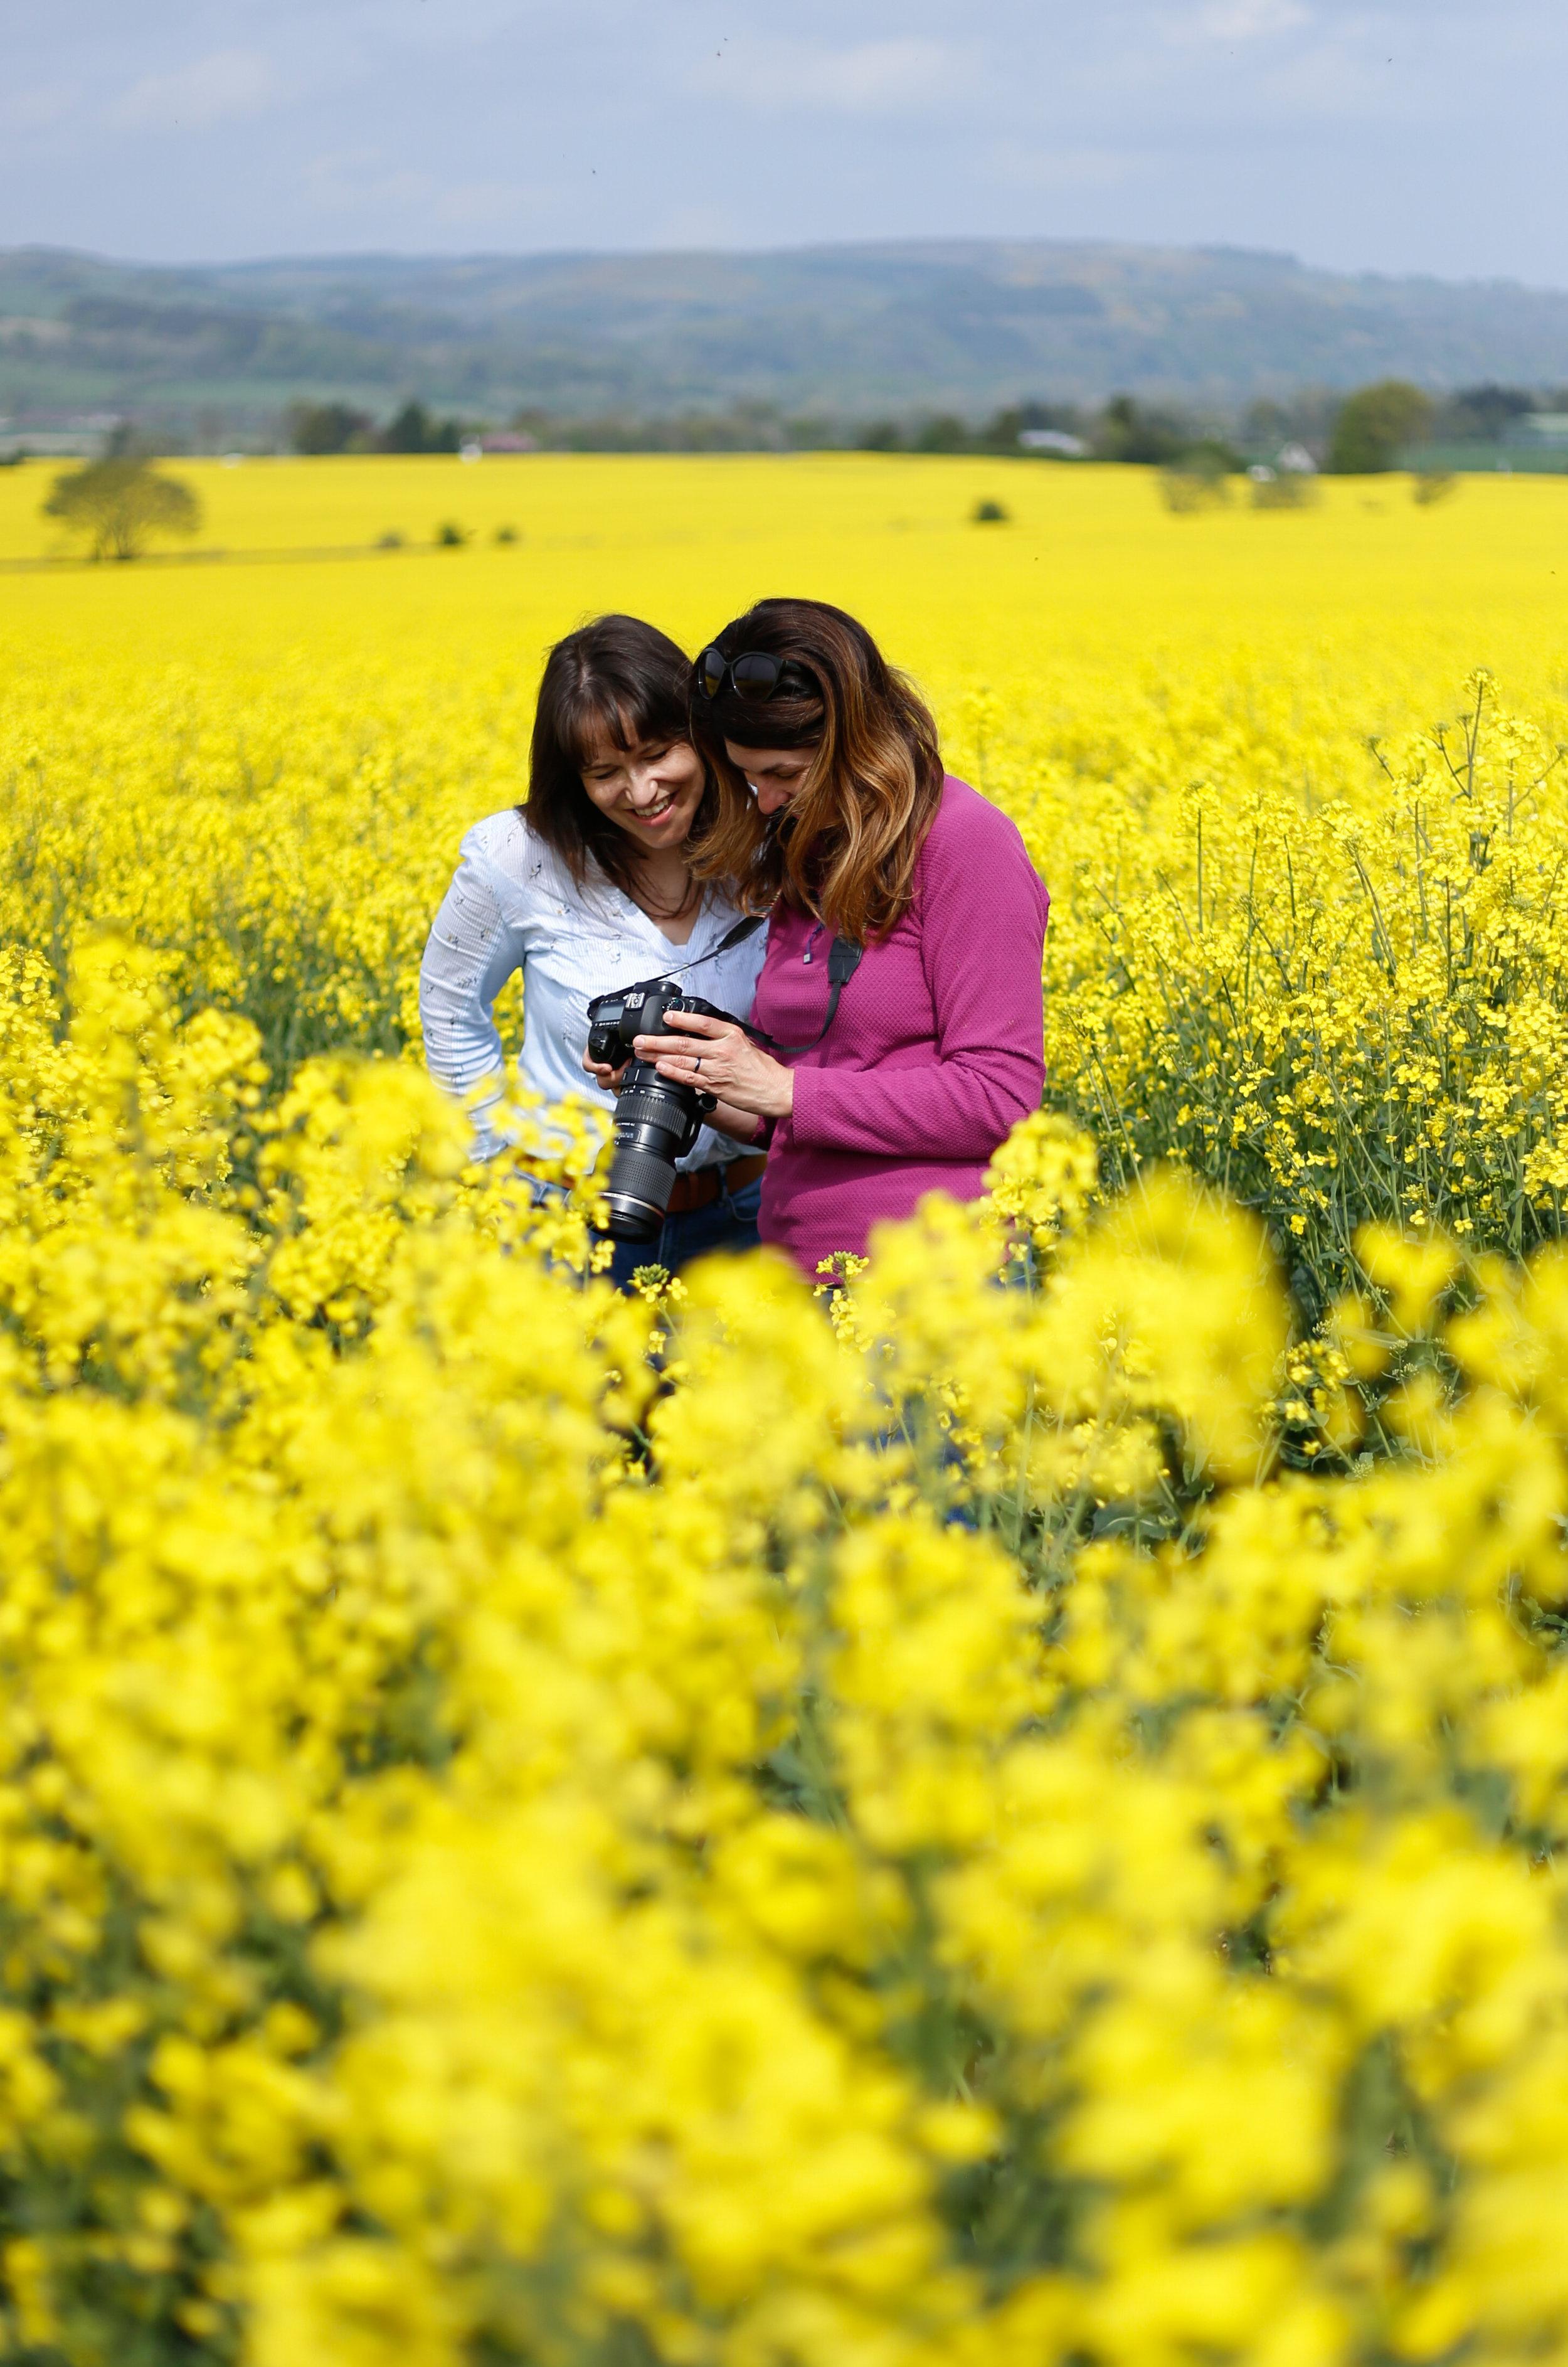 Kristy & Georgina in the Rapeseed Crop